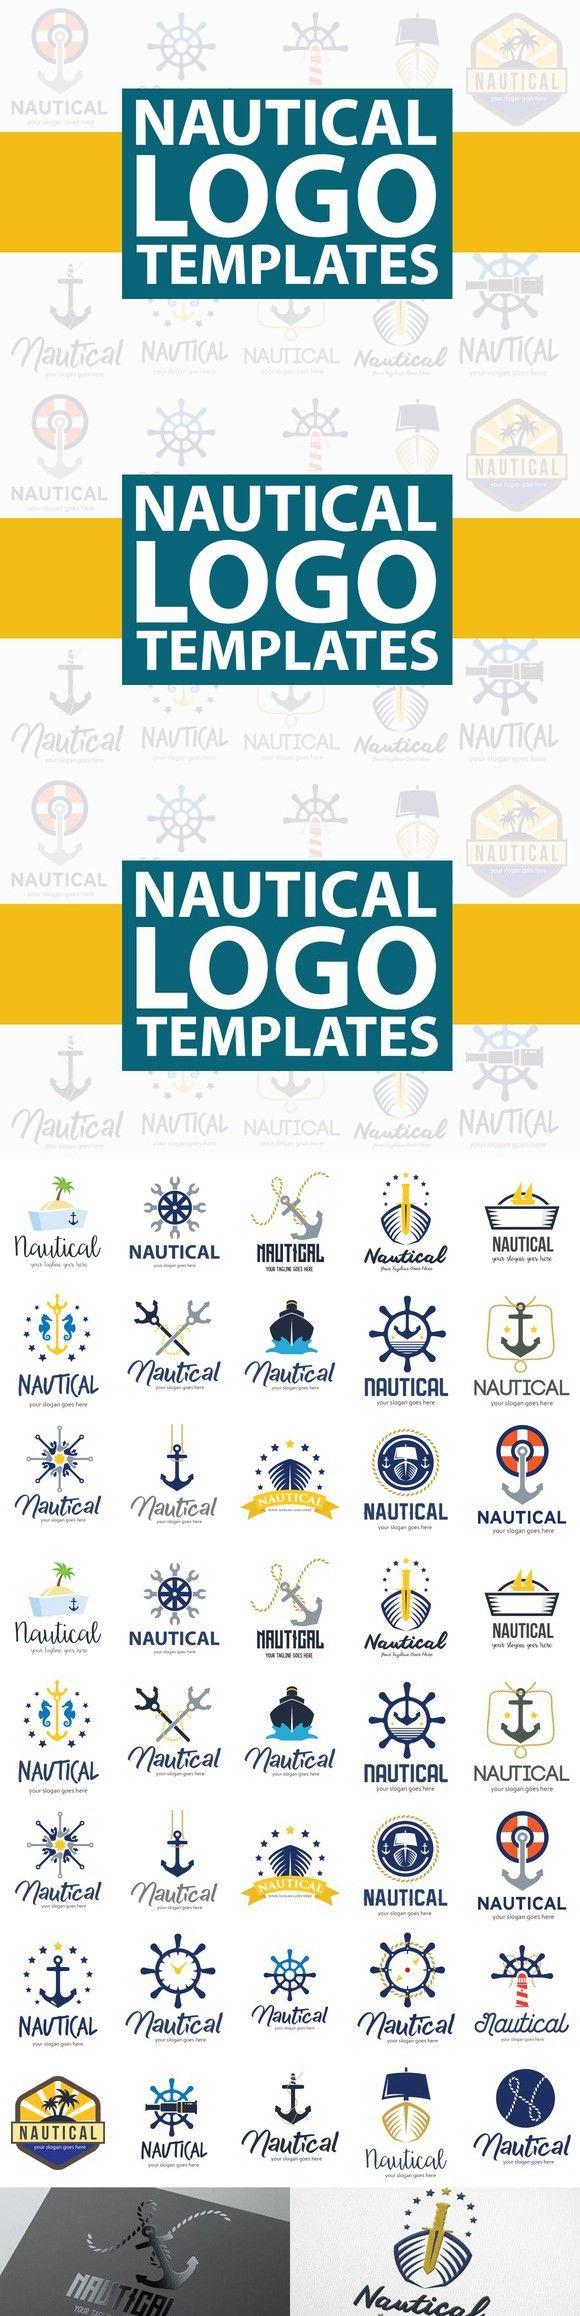 Nautical Logo Templates. $9.00